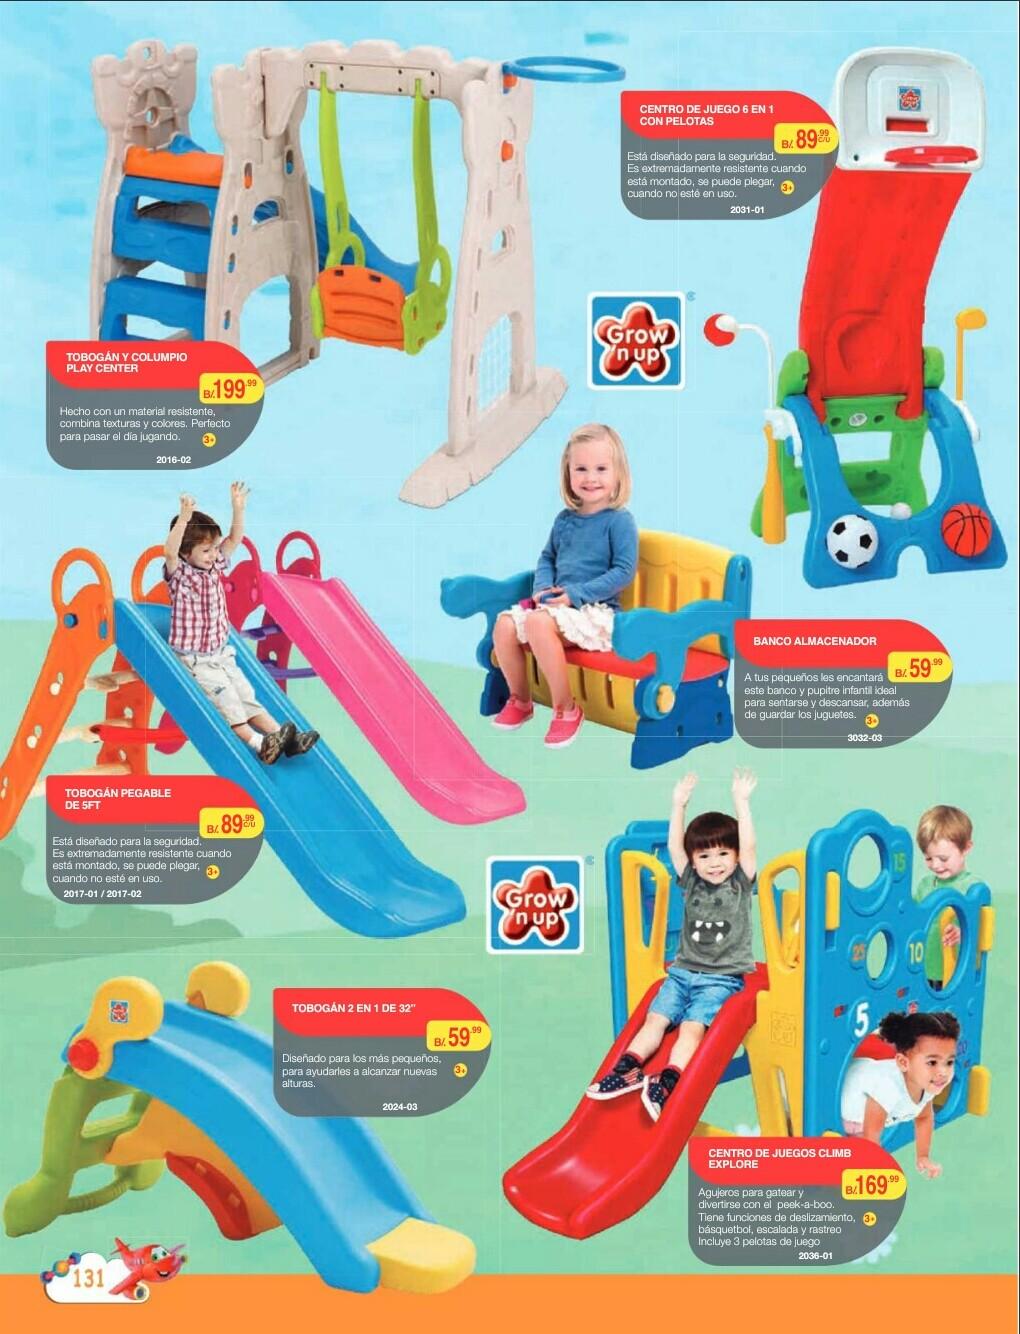 Catalogo juguetes Titan Toys 2018 p133